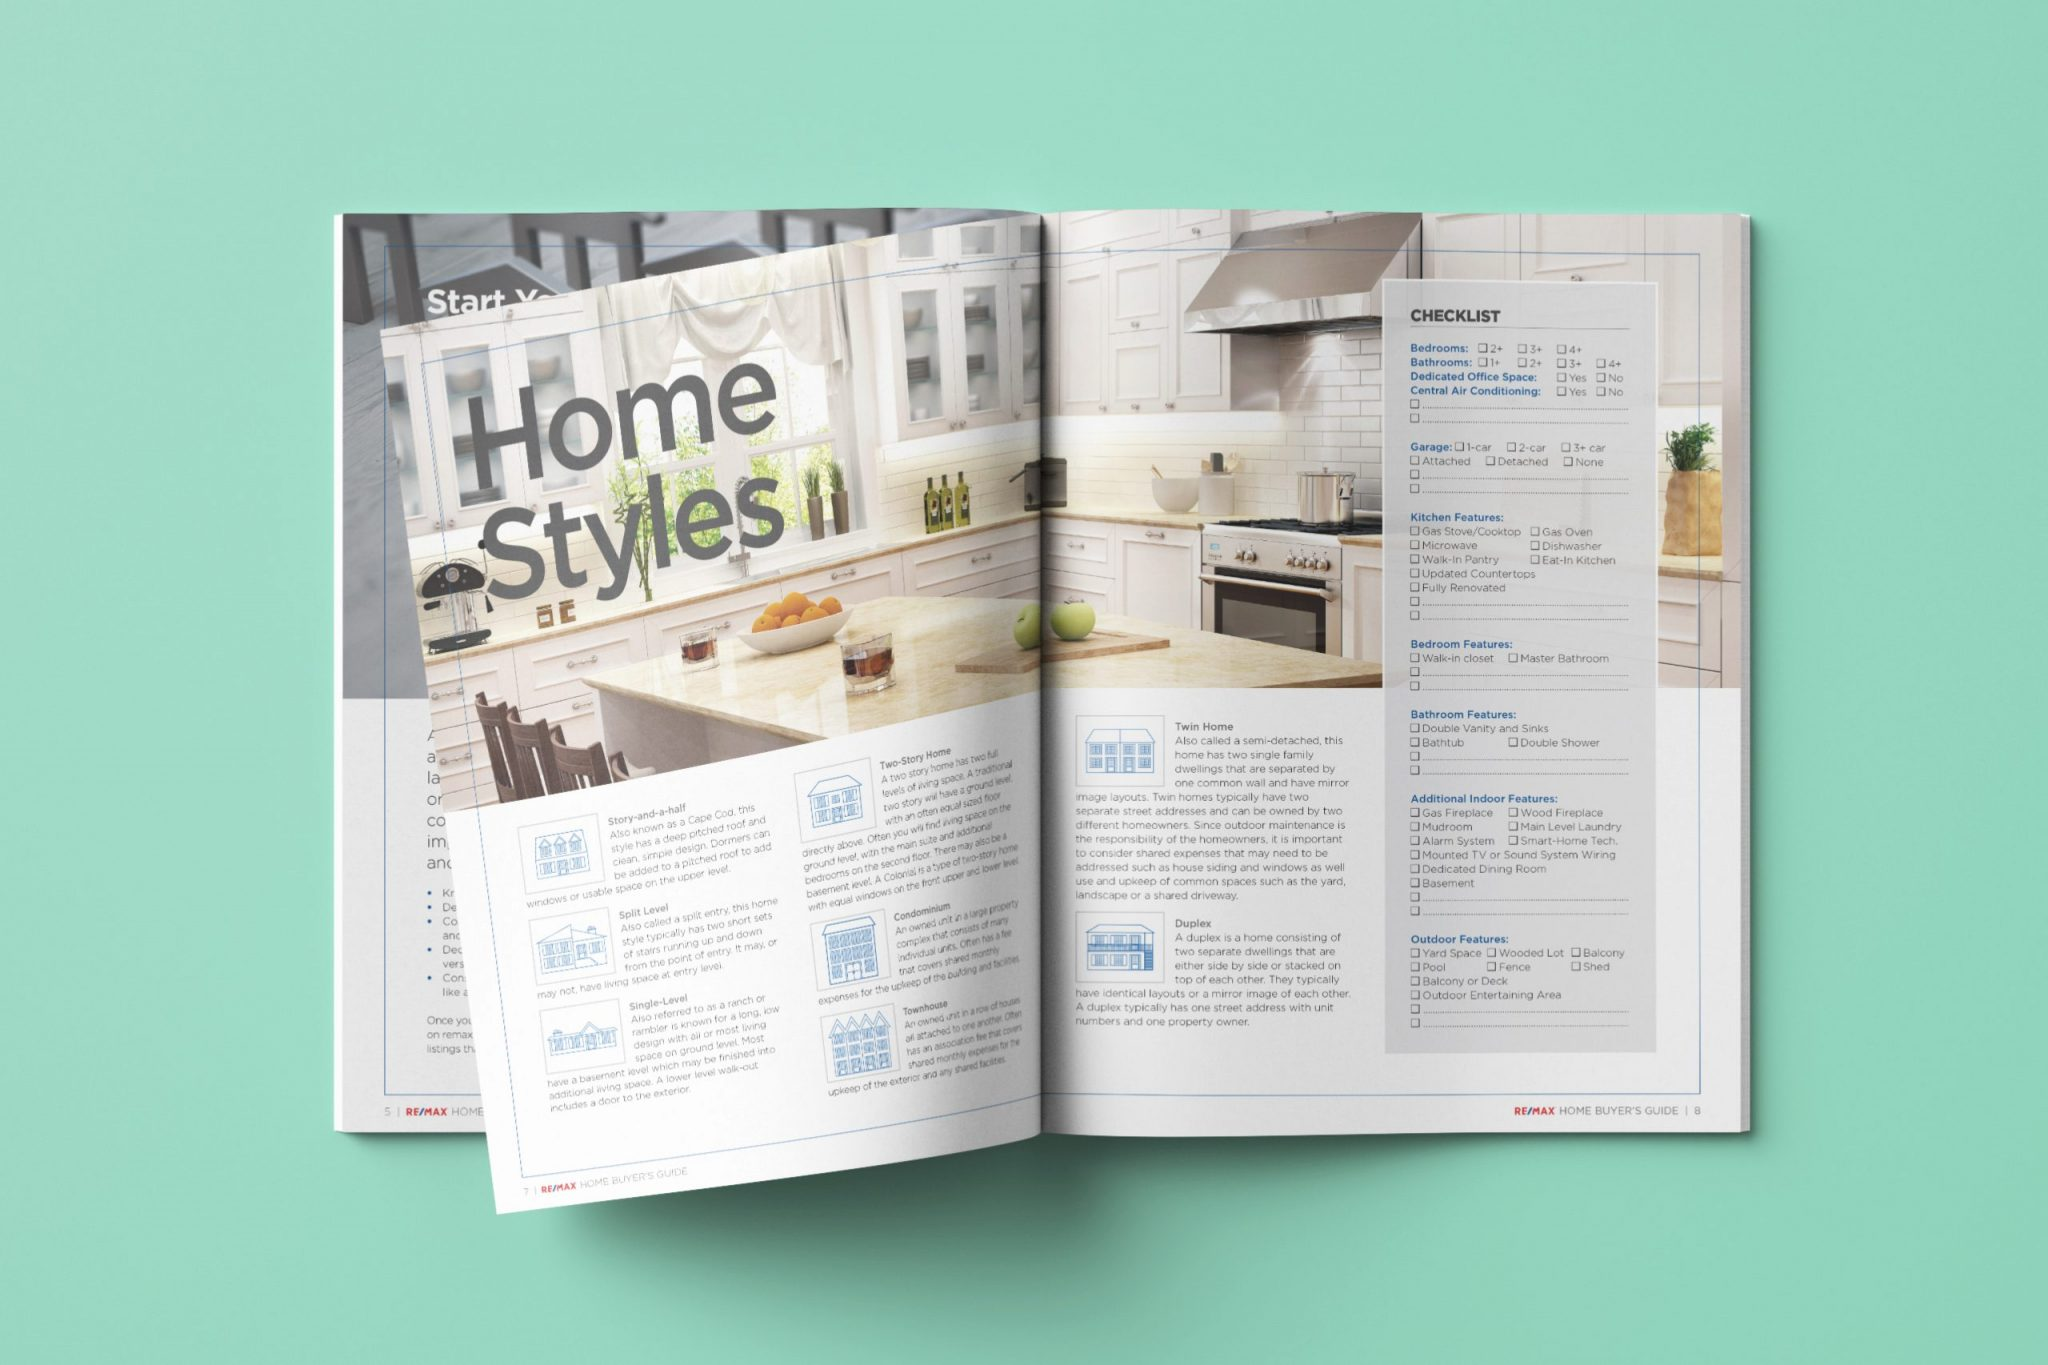 buyers-guide-spread-1